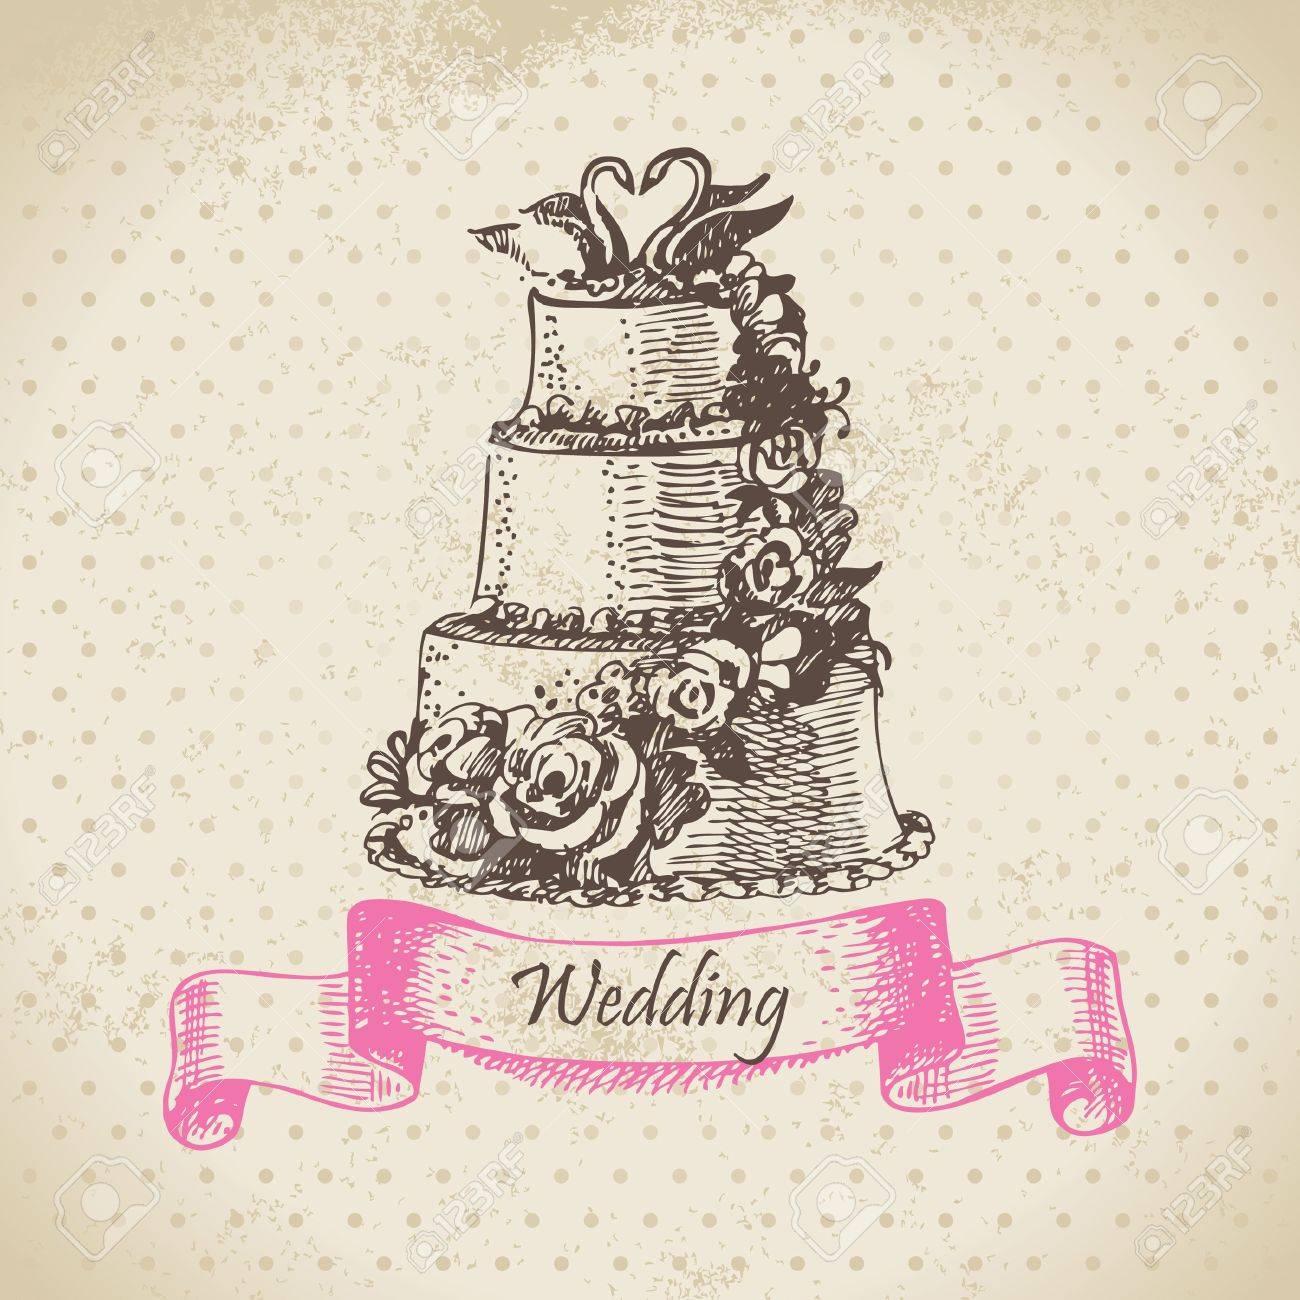 Wedding cake. Hand drawn illustration Stock Vector - 16790082